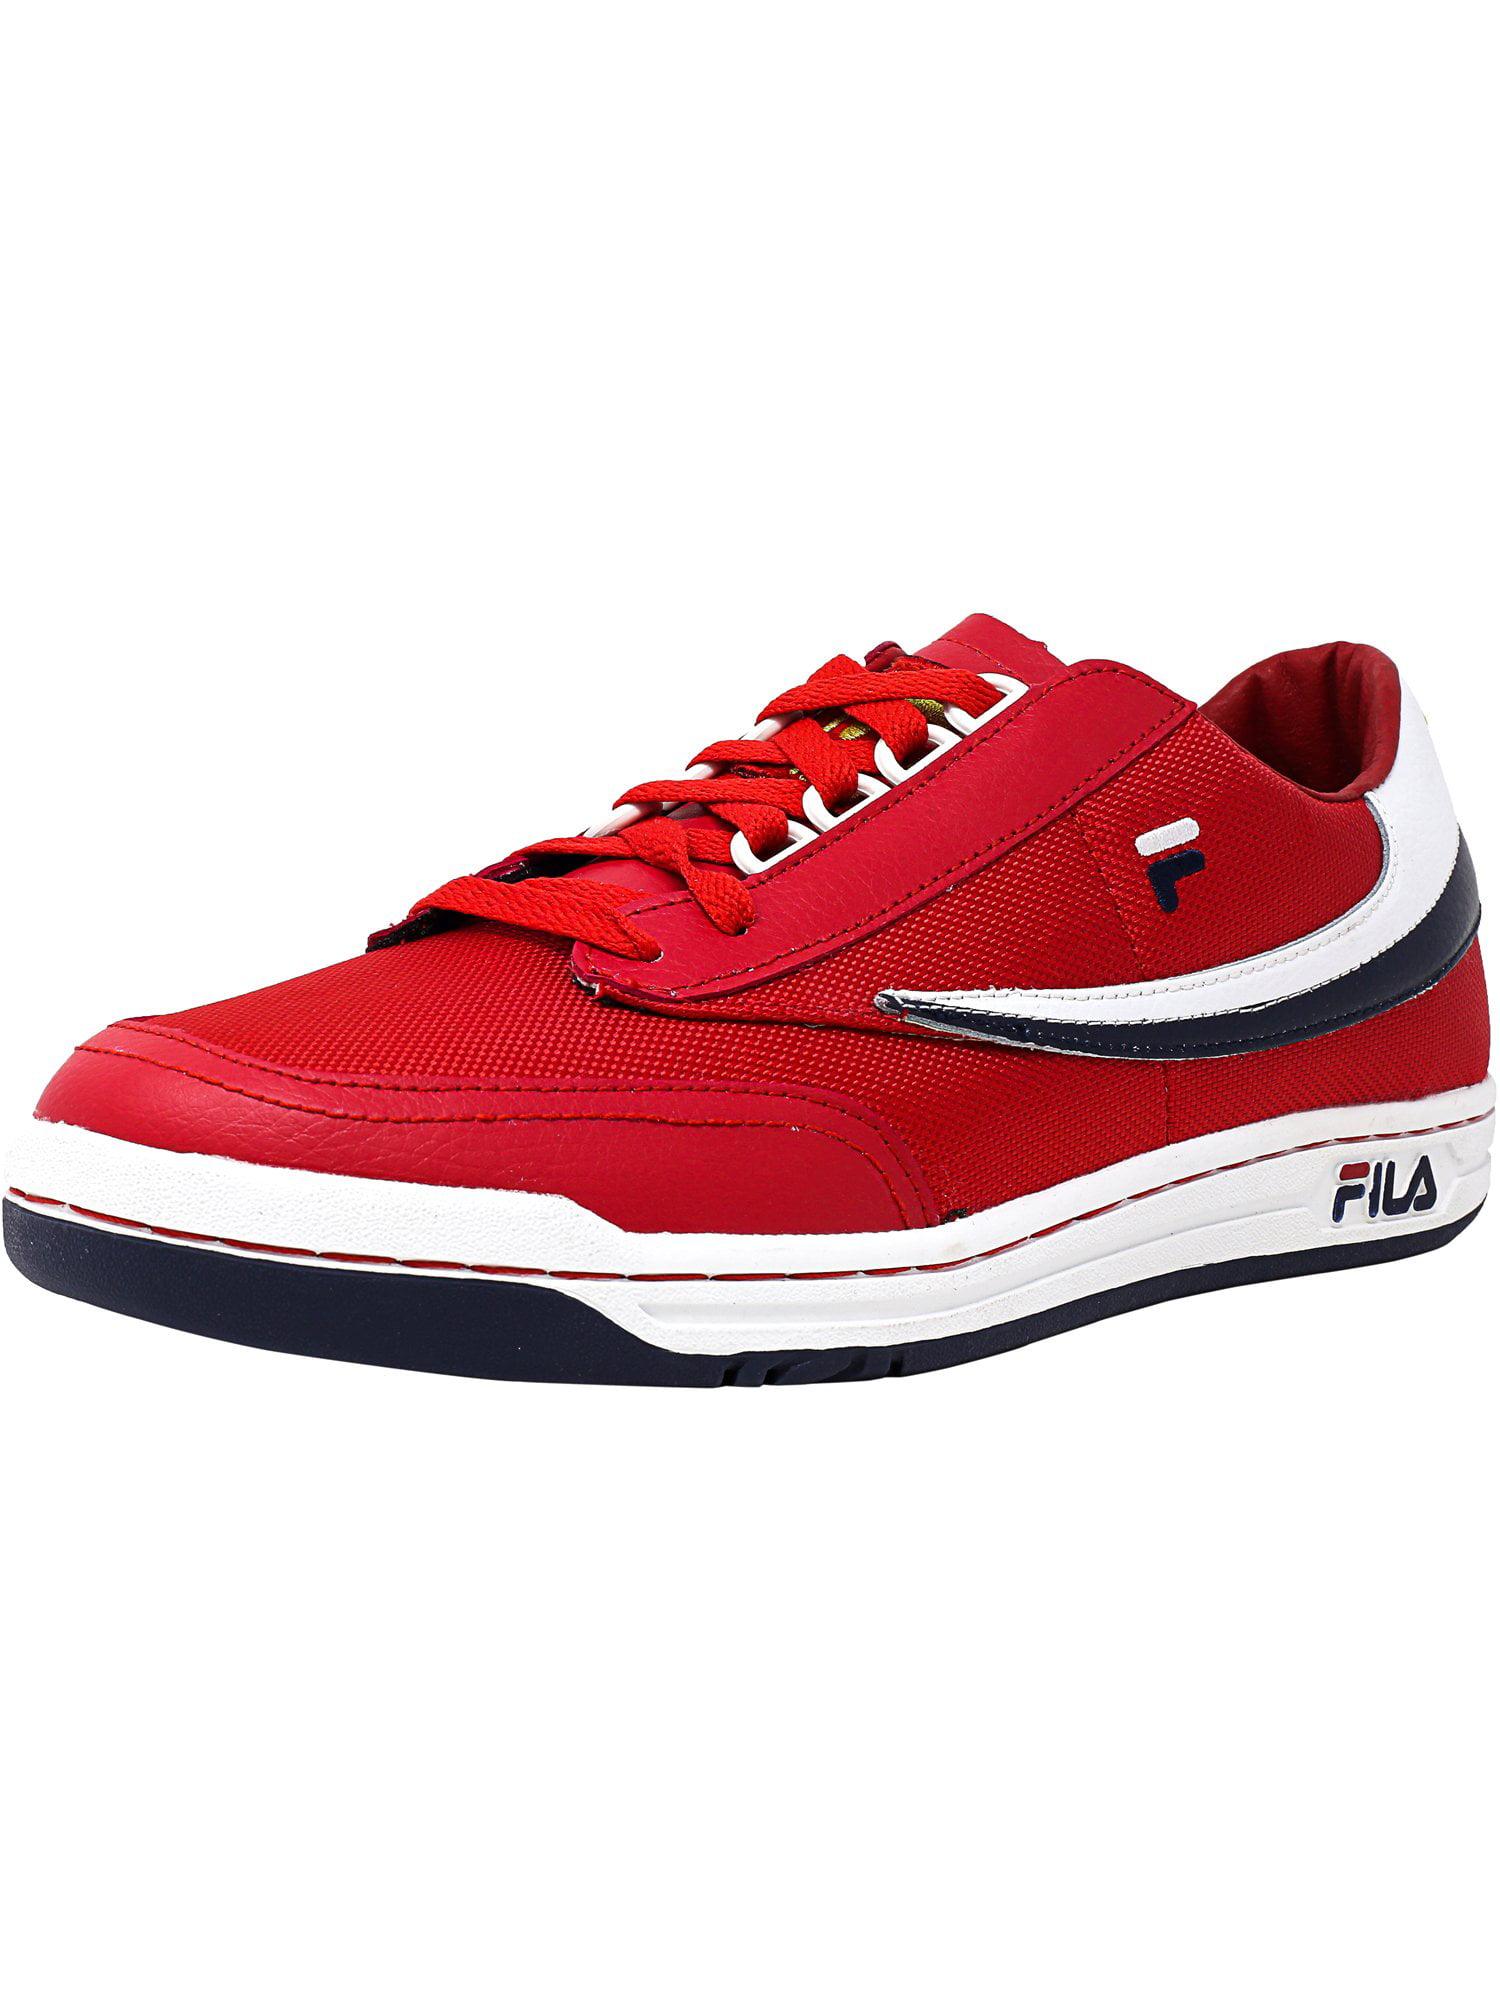 Fila Men's Original Tennis White / Navy High Rise Ankle-High Shoe - 8.5M